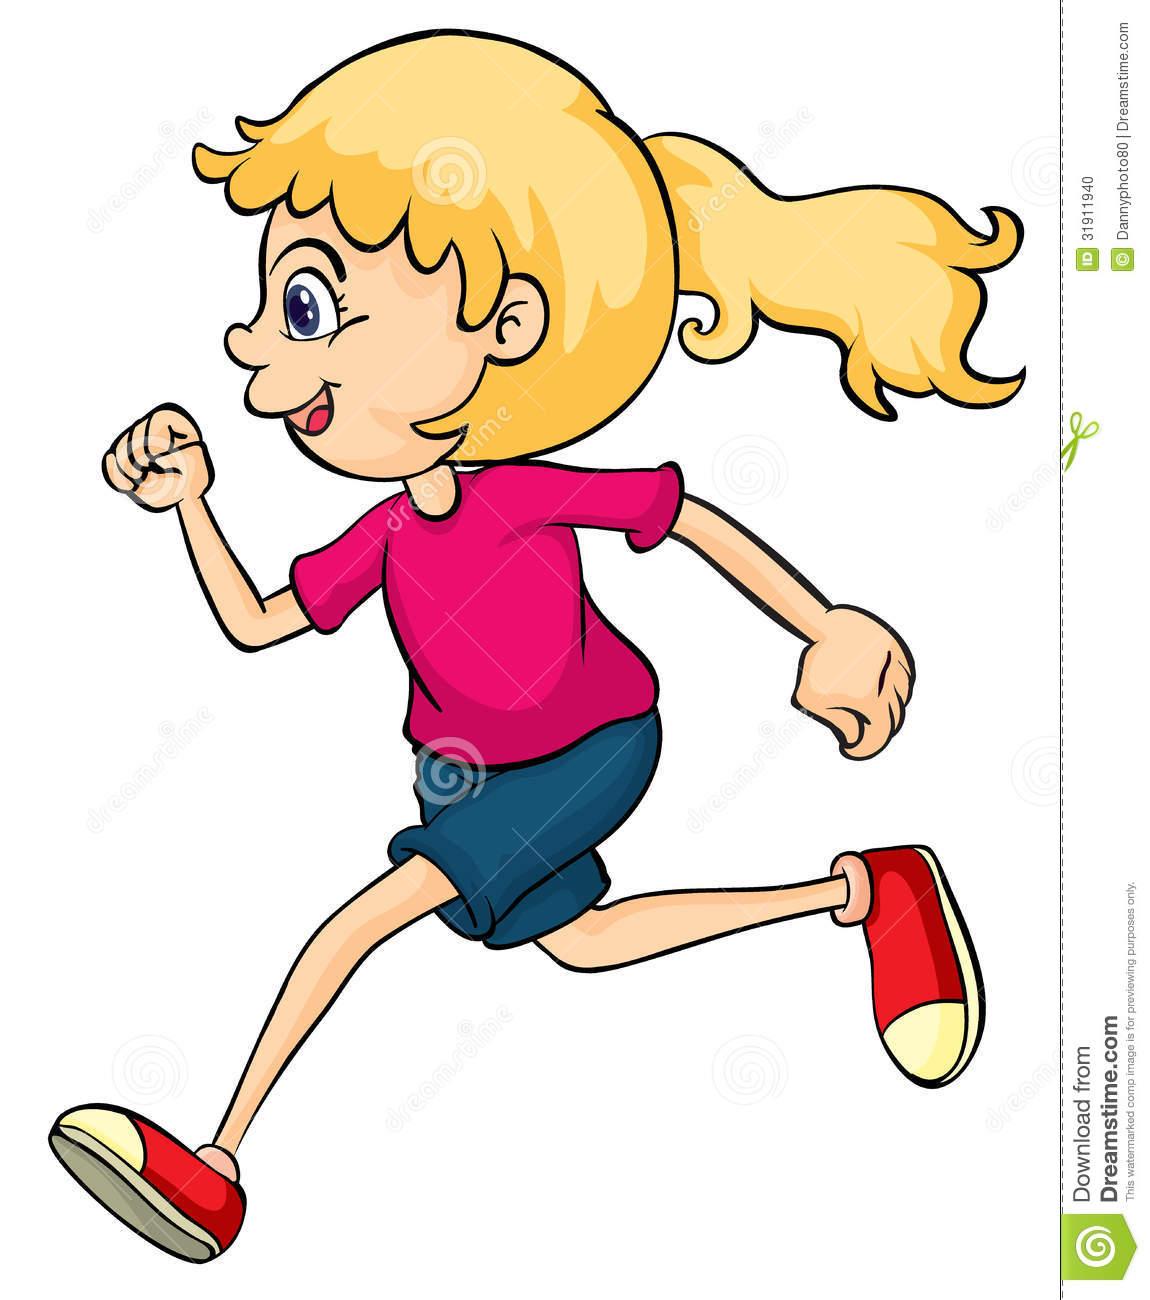 903 Girl Running free clipart.